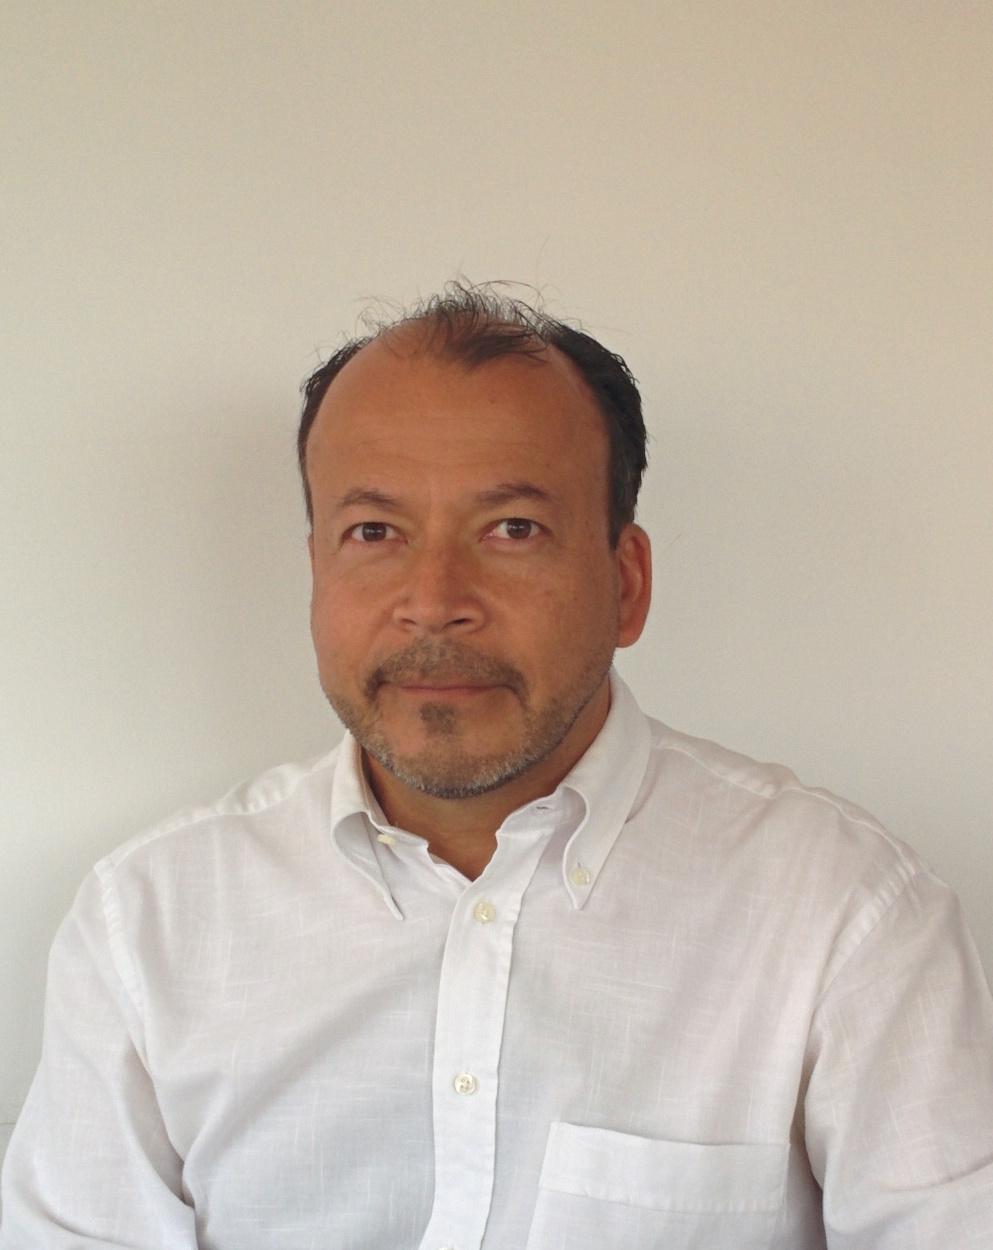 Adrían Fernández CEO, Latin America Regional Climate Iniciative.